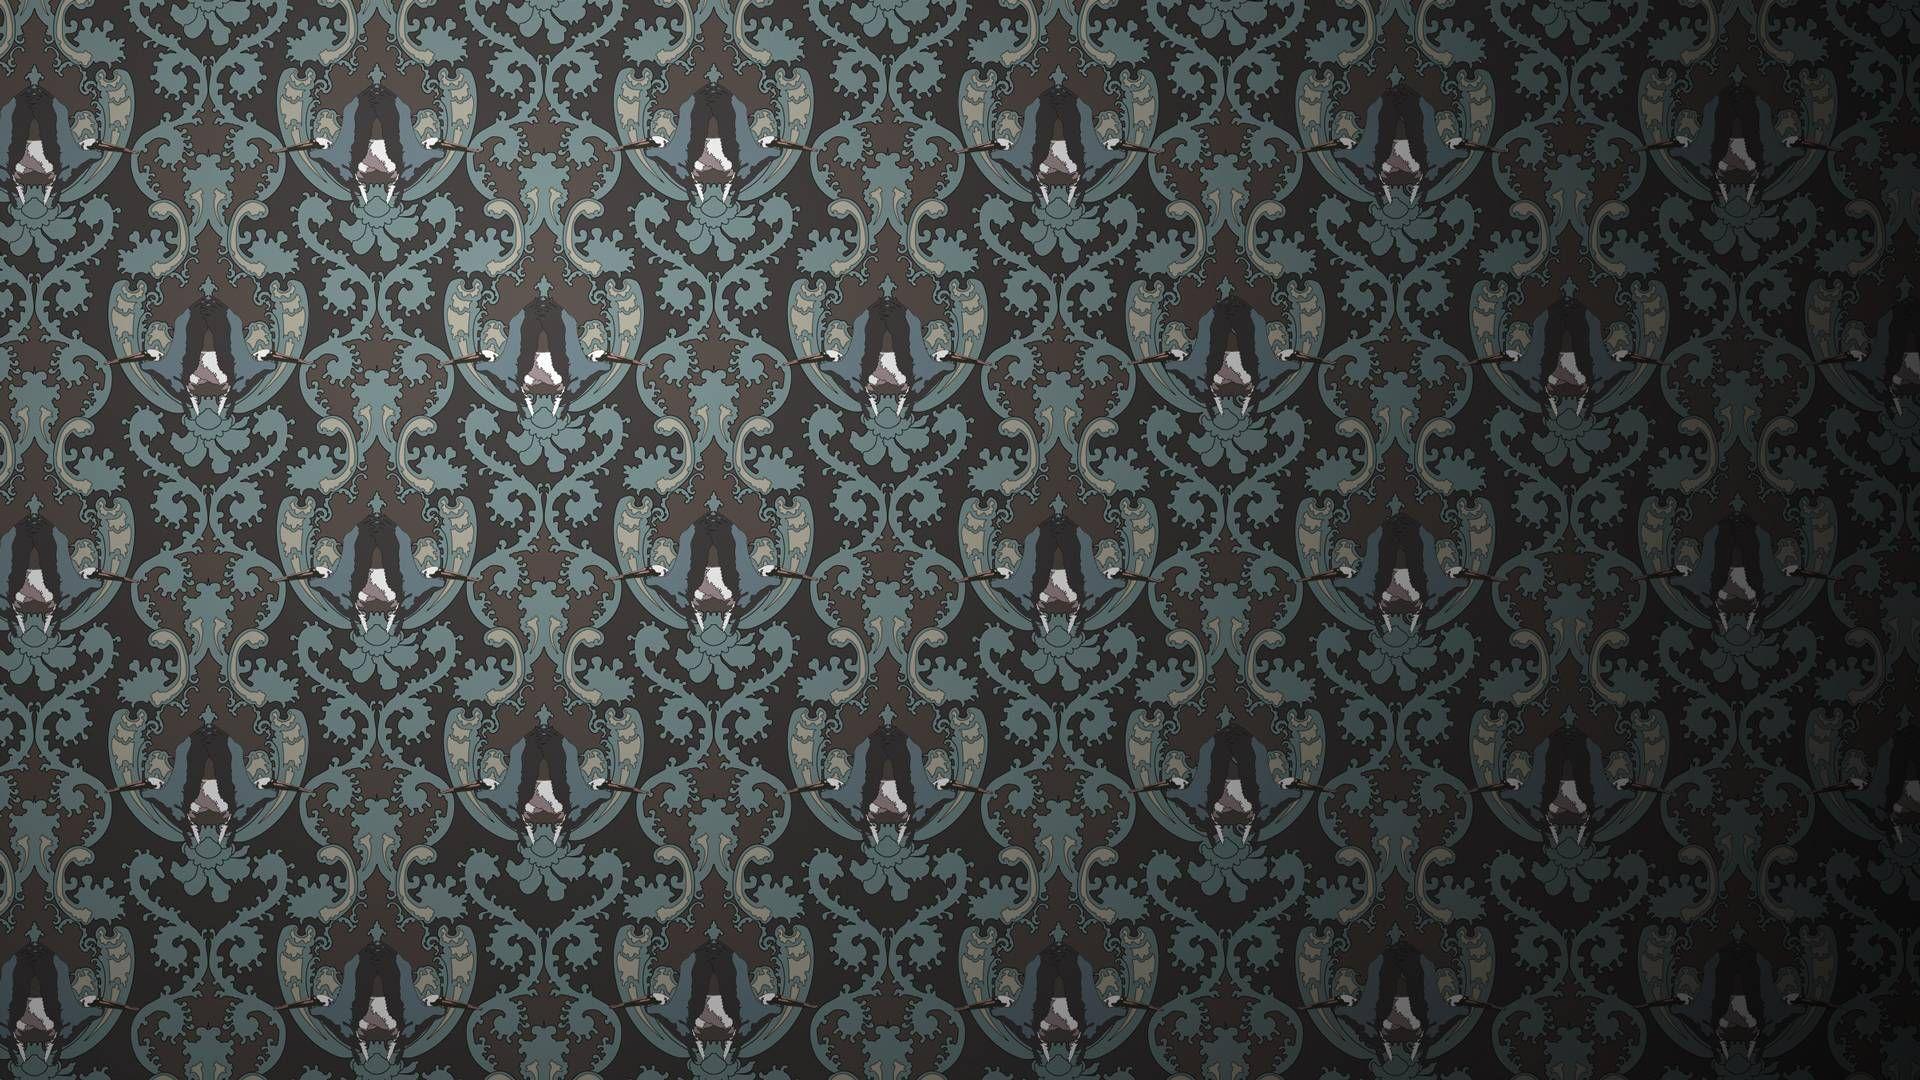 Victorian Gothic Patterns 122 Inspiration Designs In